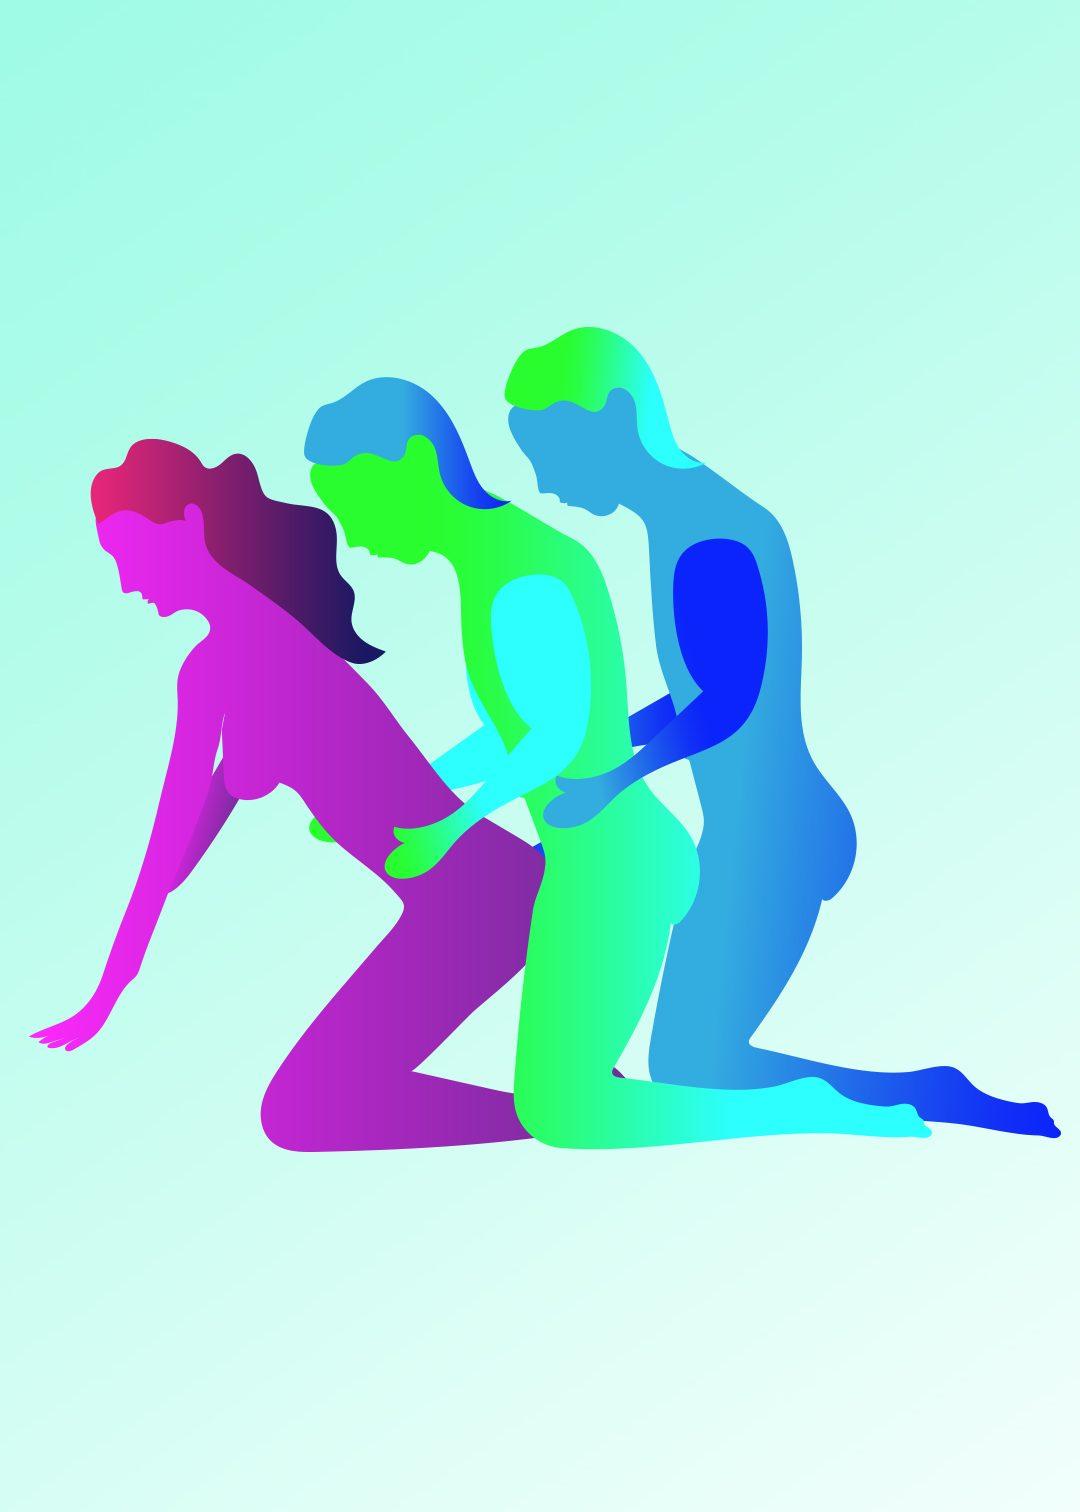 Positions mfm threesome 9 Threesome